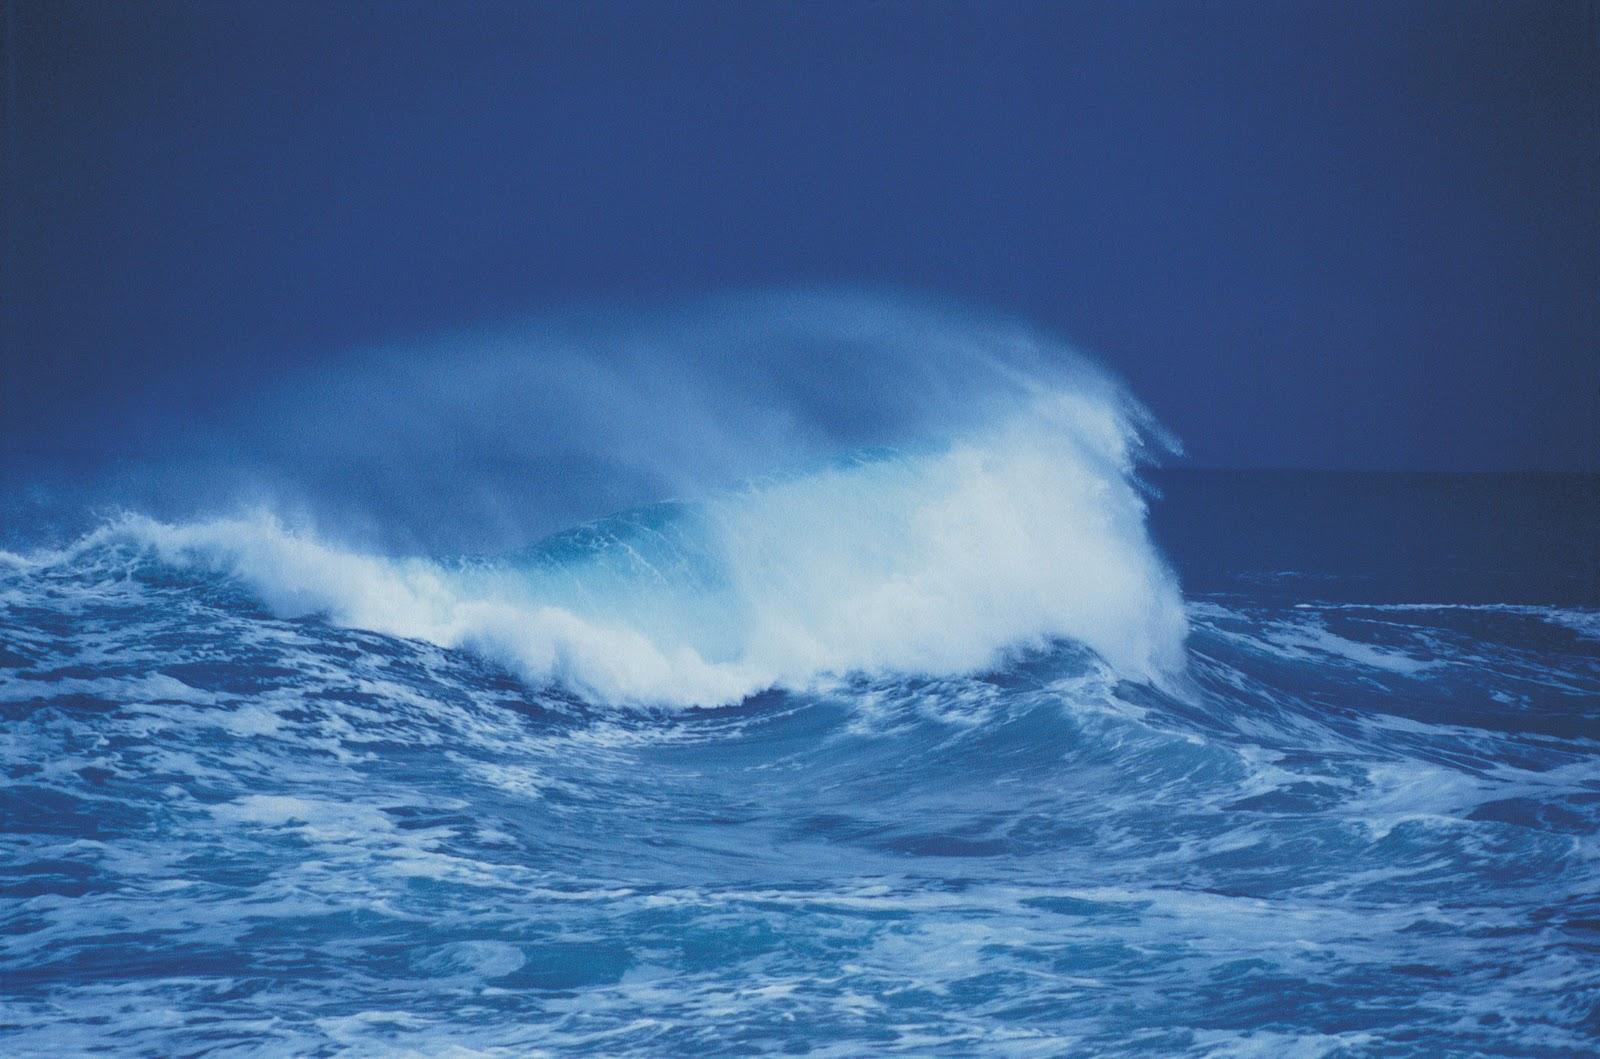 Gambar Ajaib Tsunami Bellissimonyccom